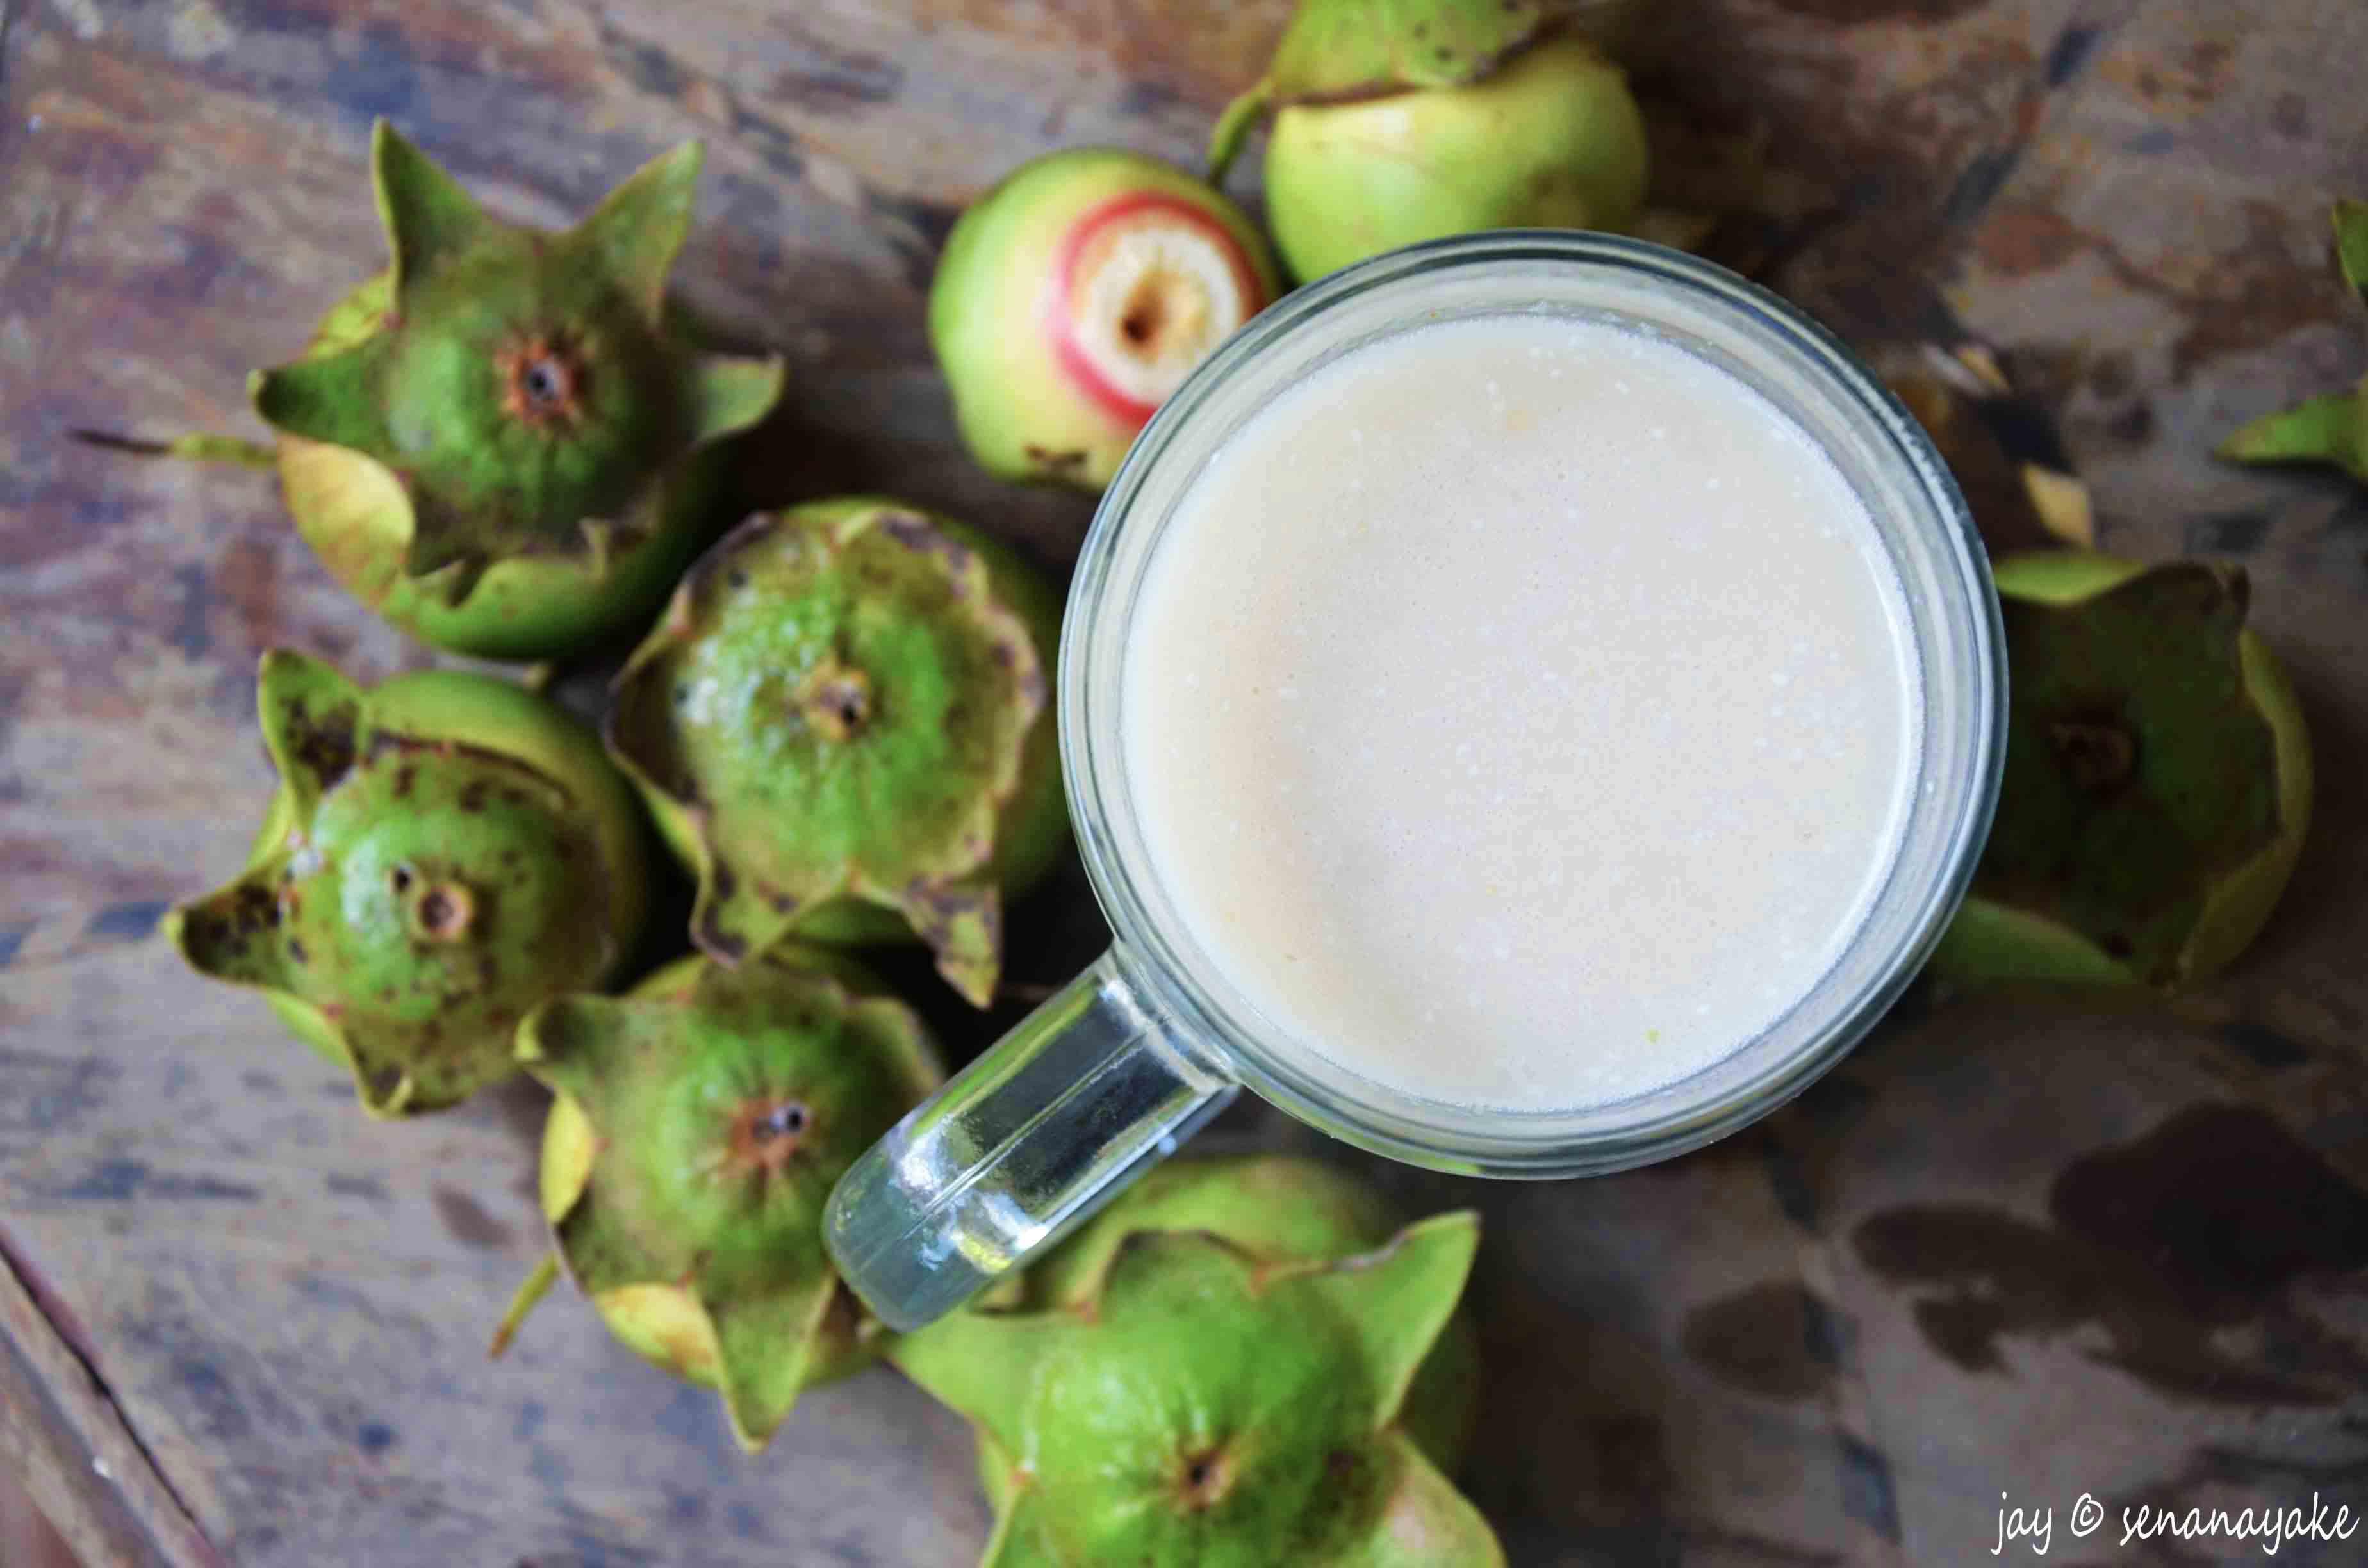 Kirala juice